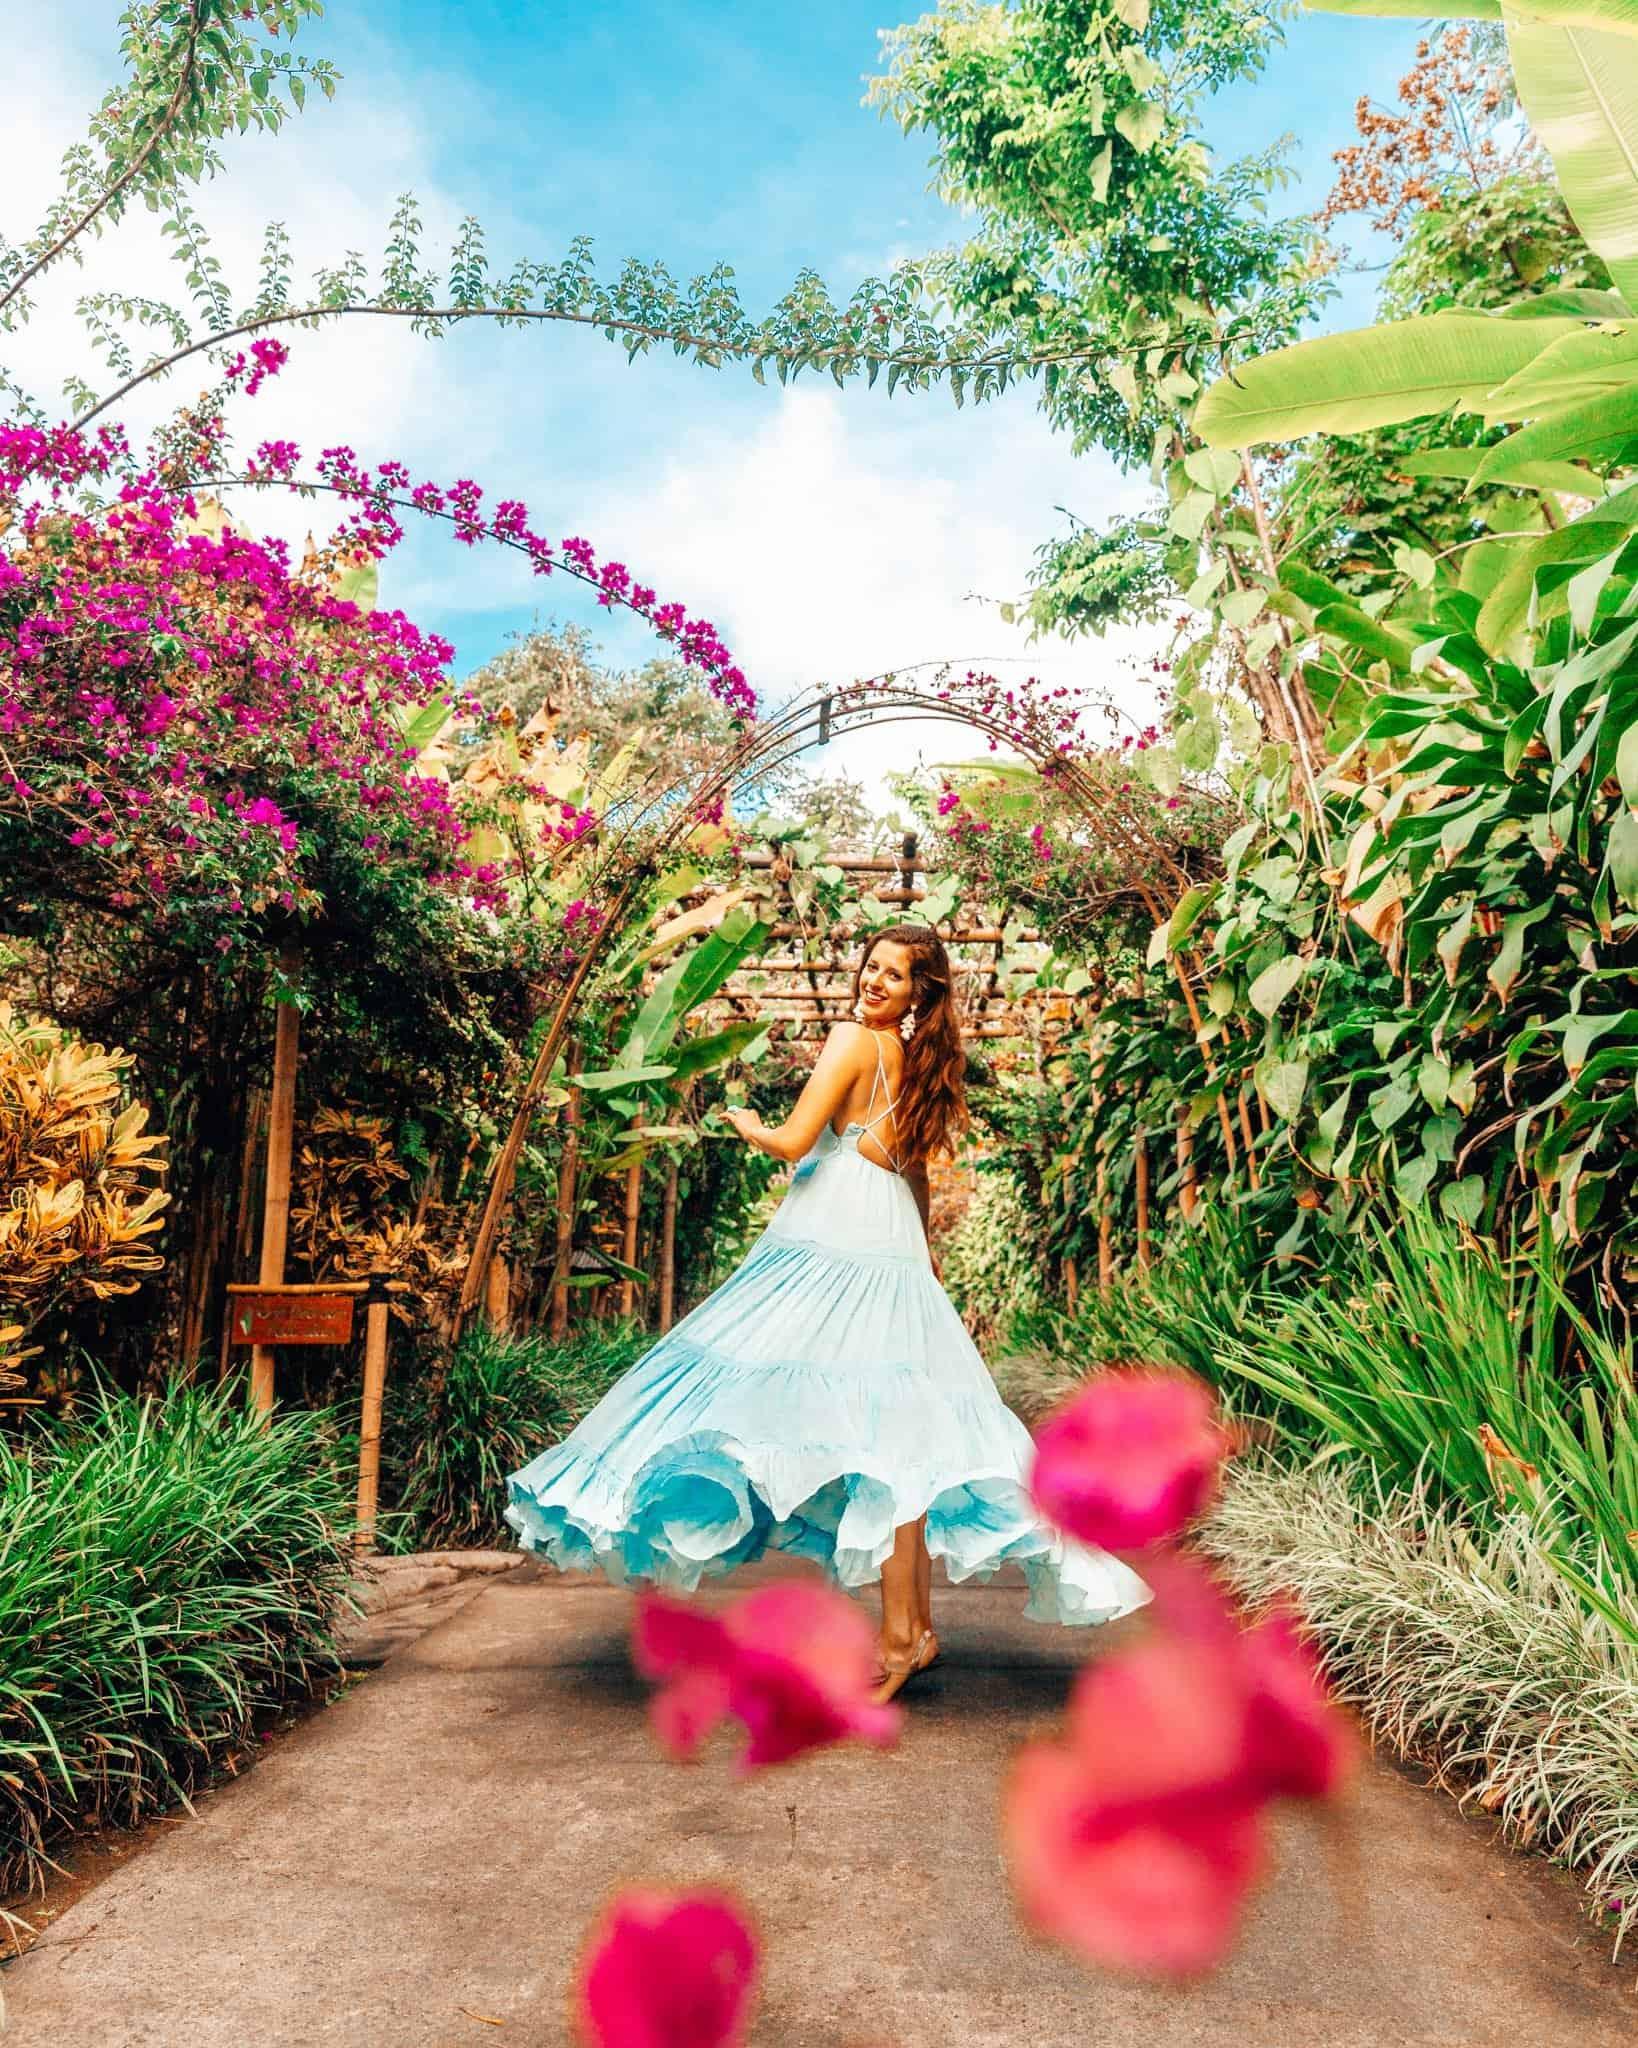 Bettina at Munduk Moding Plantation in Bali - The Next Trip